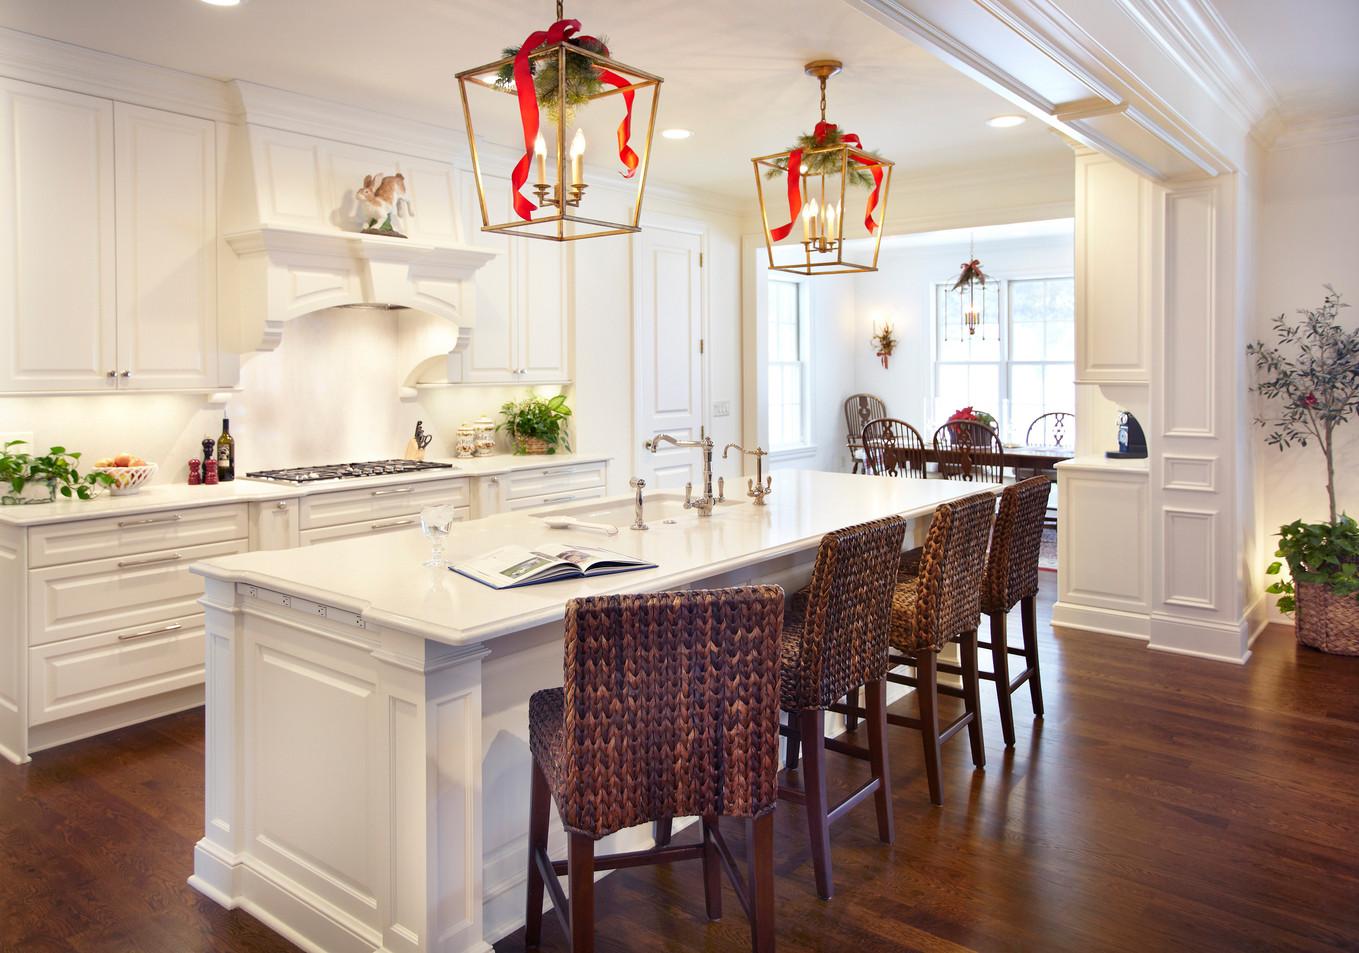 N_5285_Kitchen and Bar.jpg